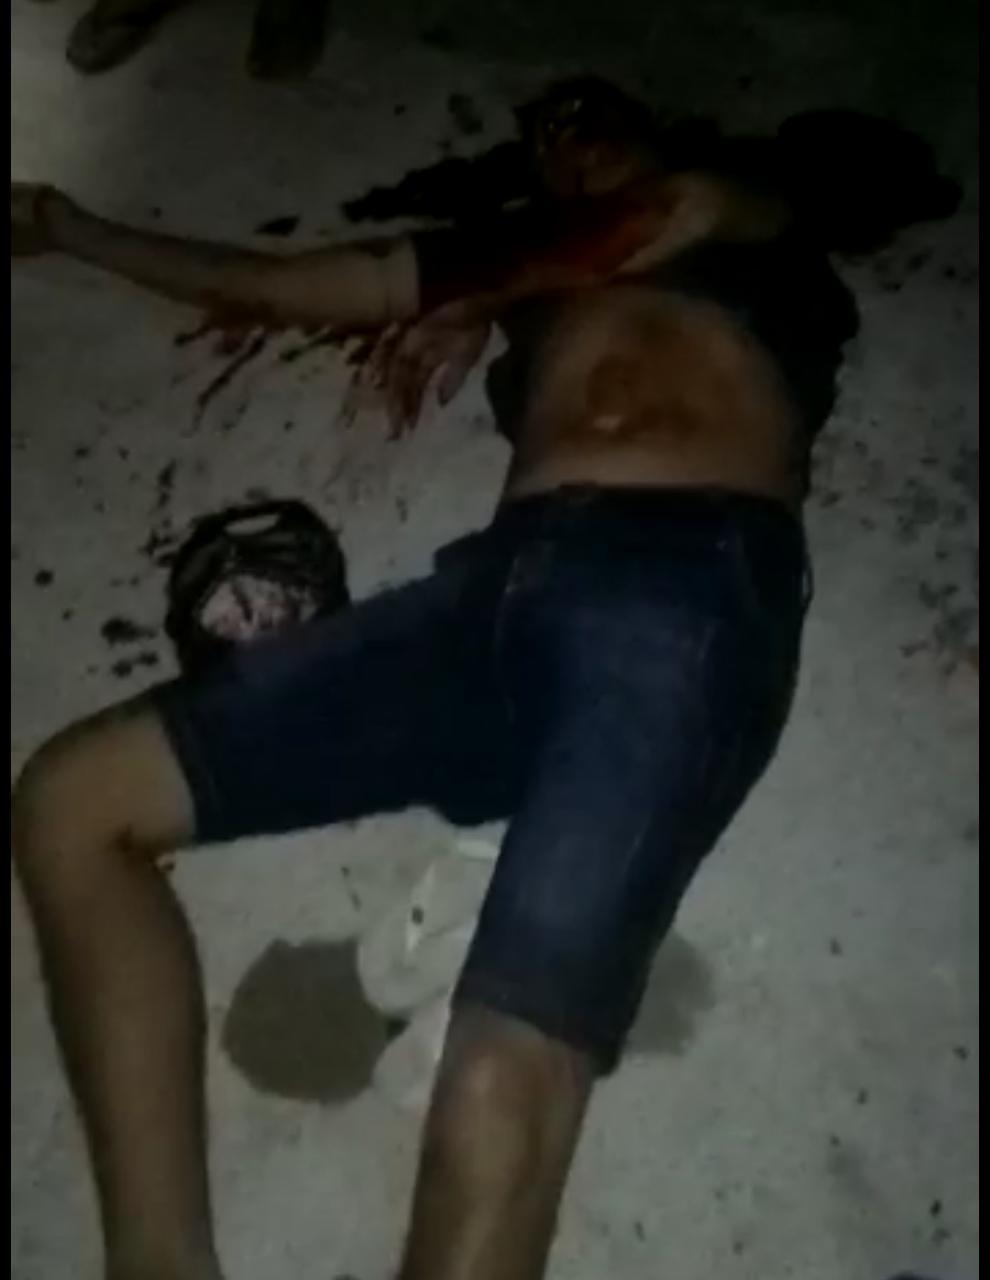 murder in brazil